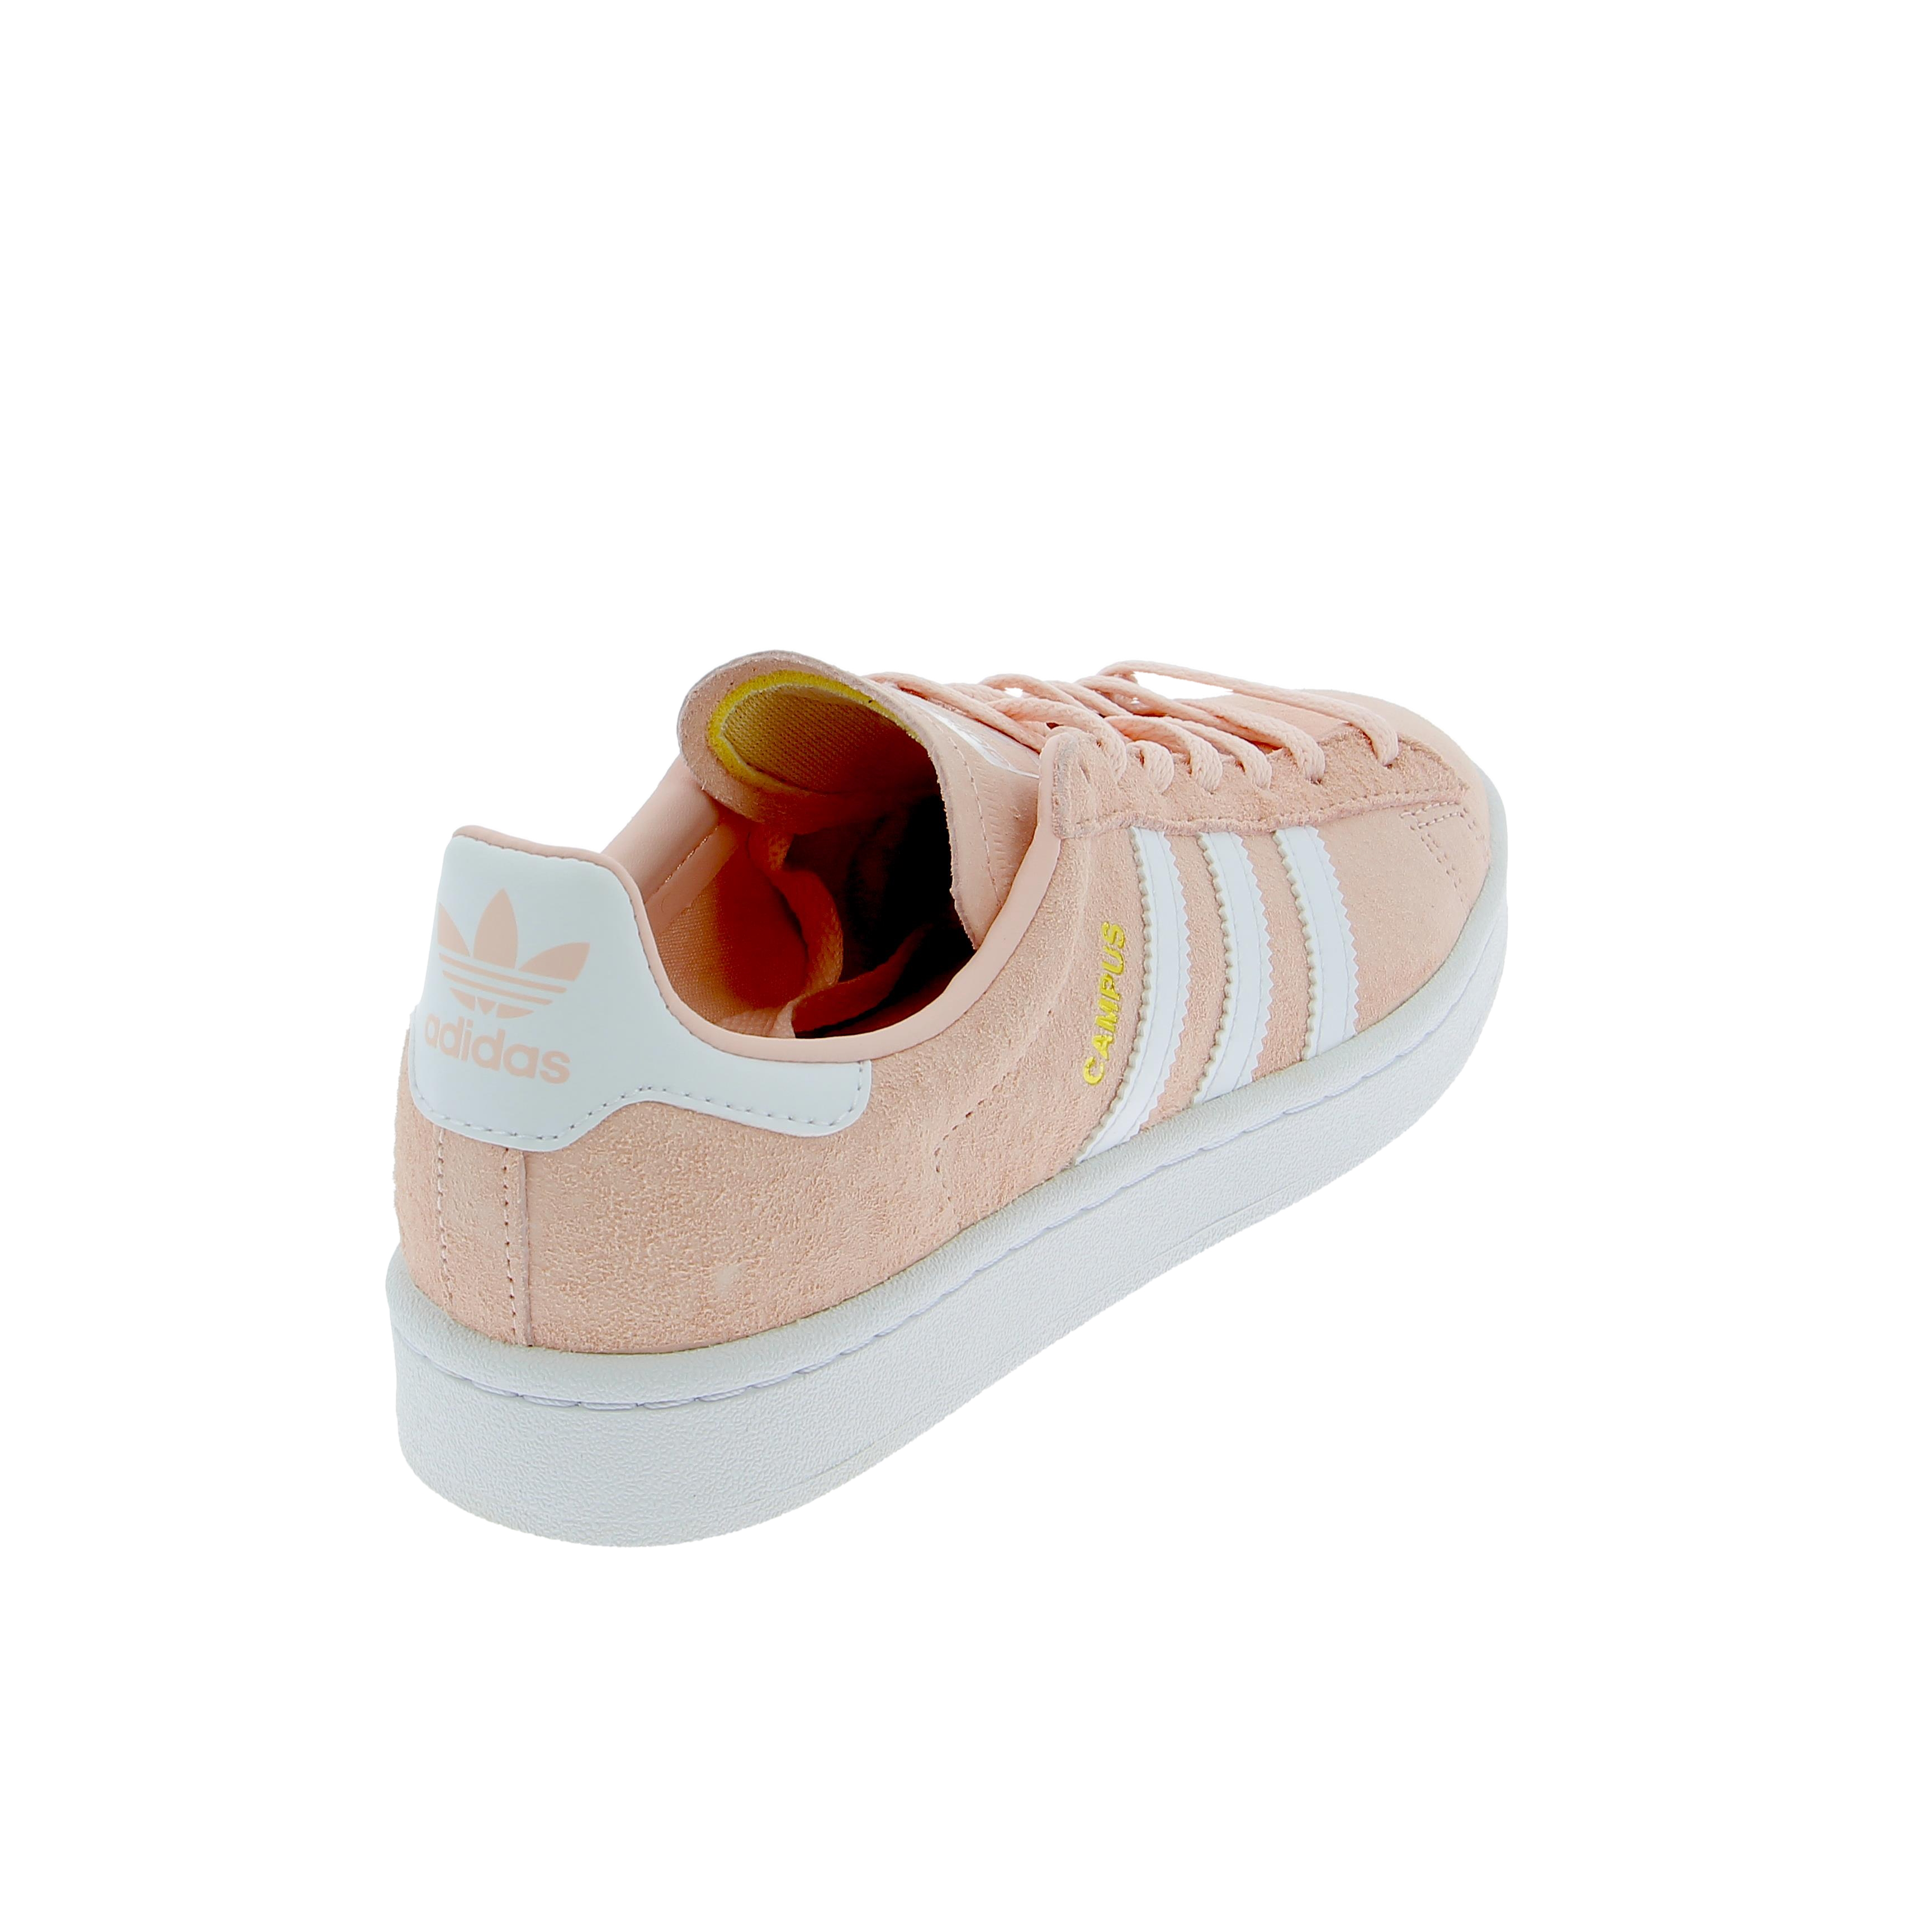 Adidas Sneakers roze